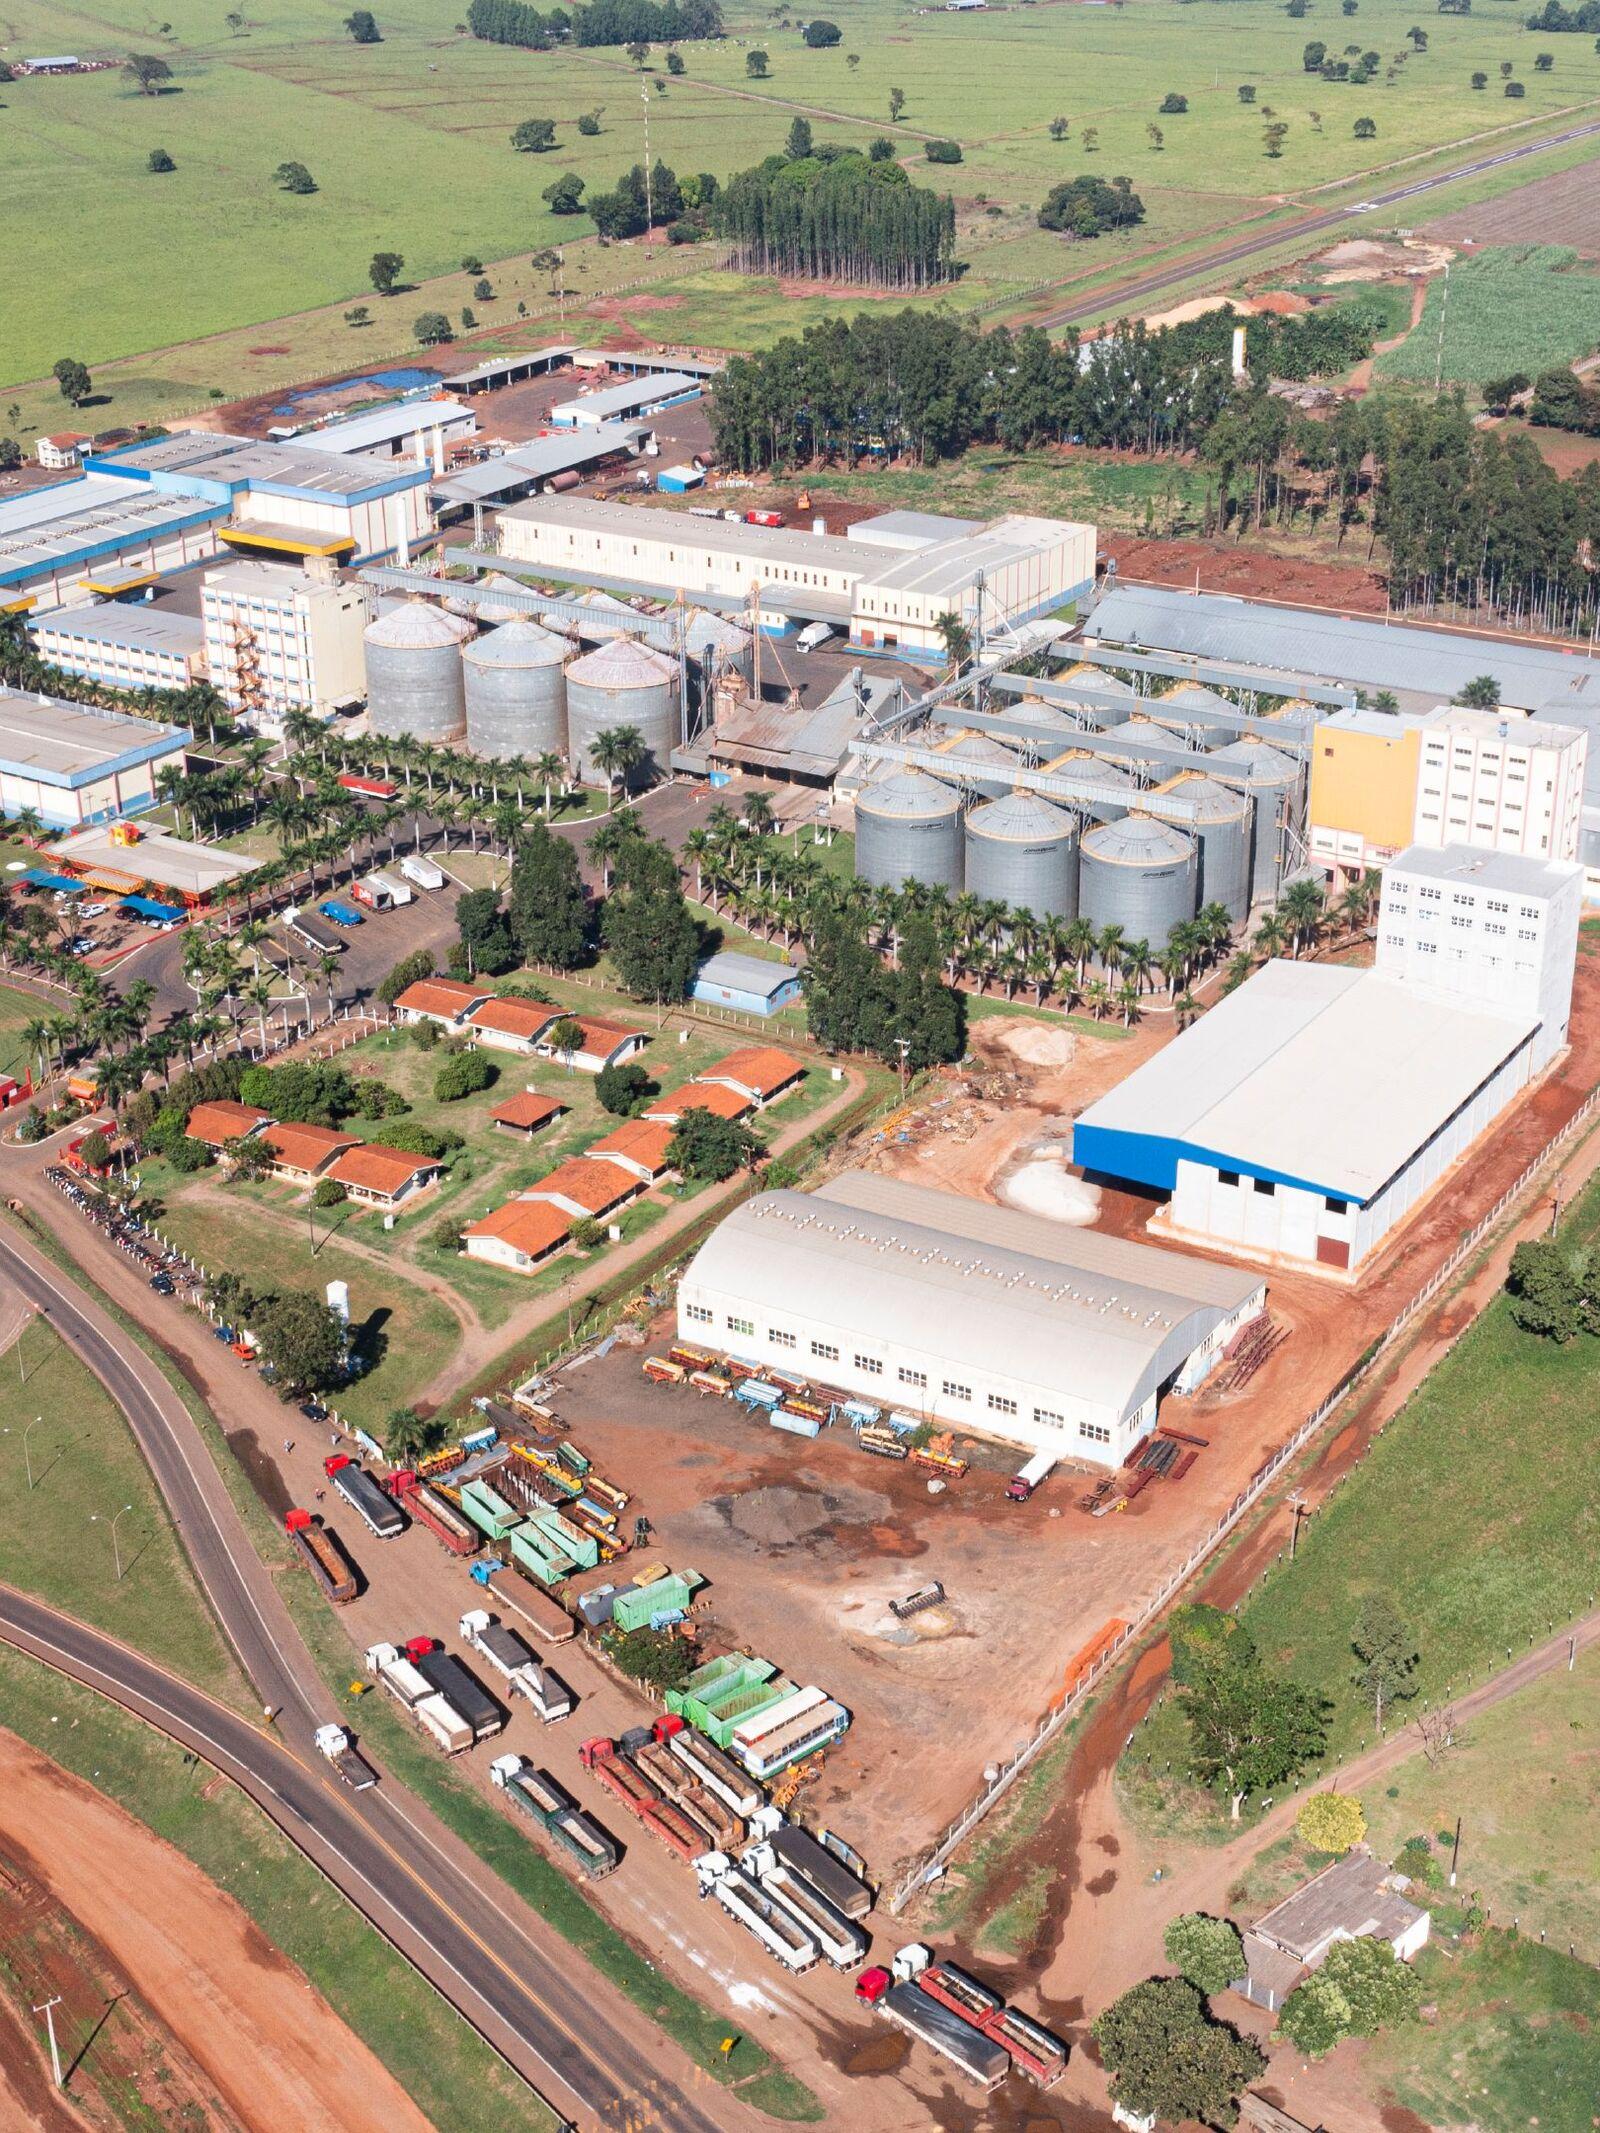 Factory Dallas Alimentos in Nova Alvorada do Sul (MS).